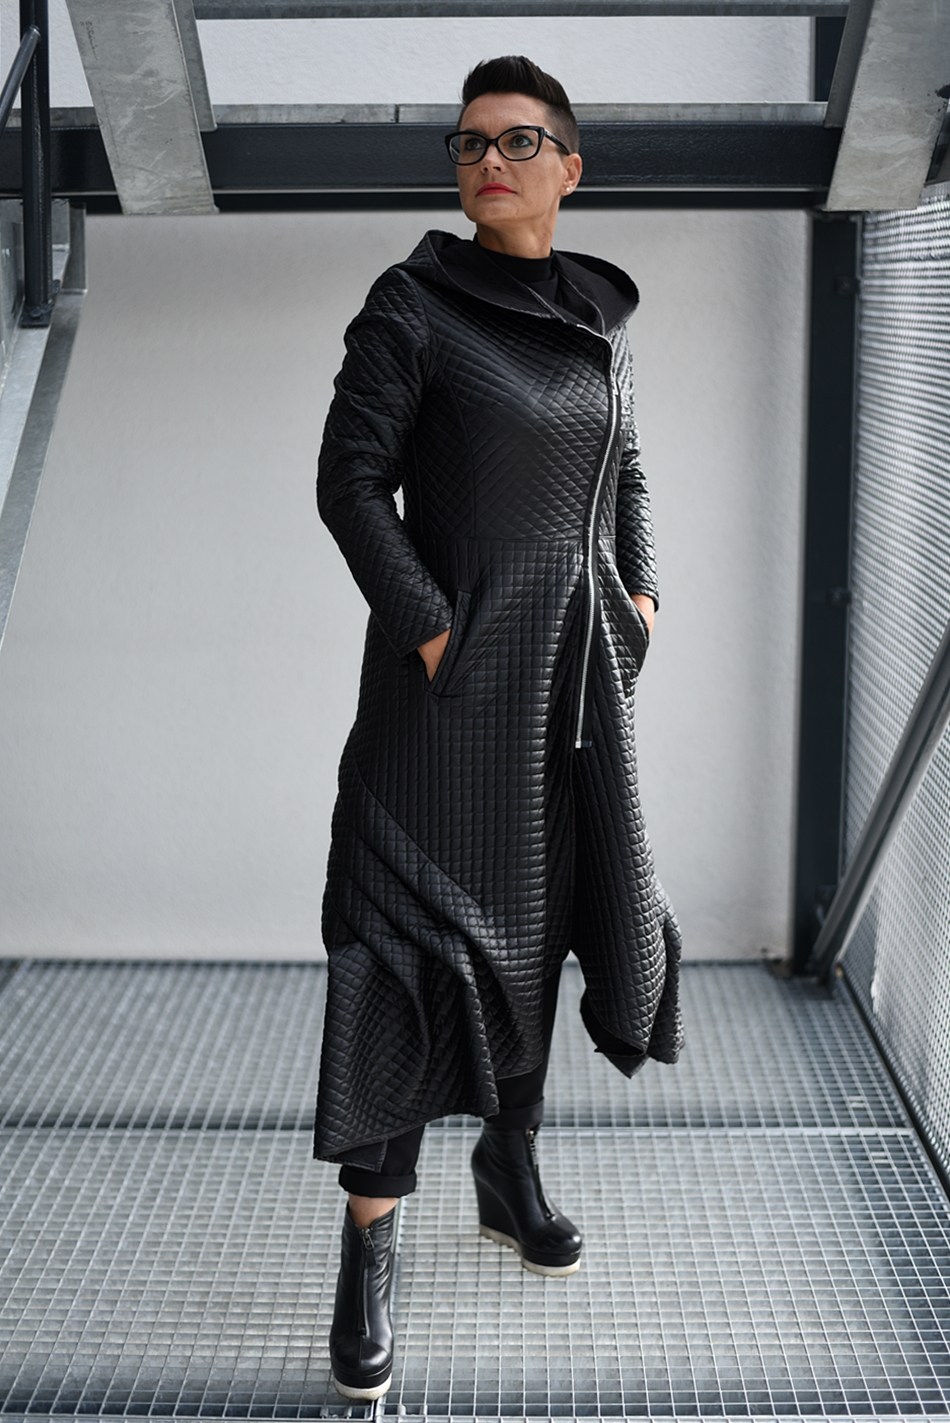 Broth_design_clothes_062